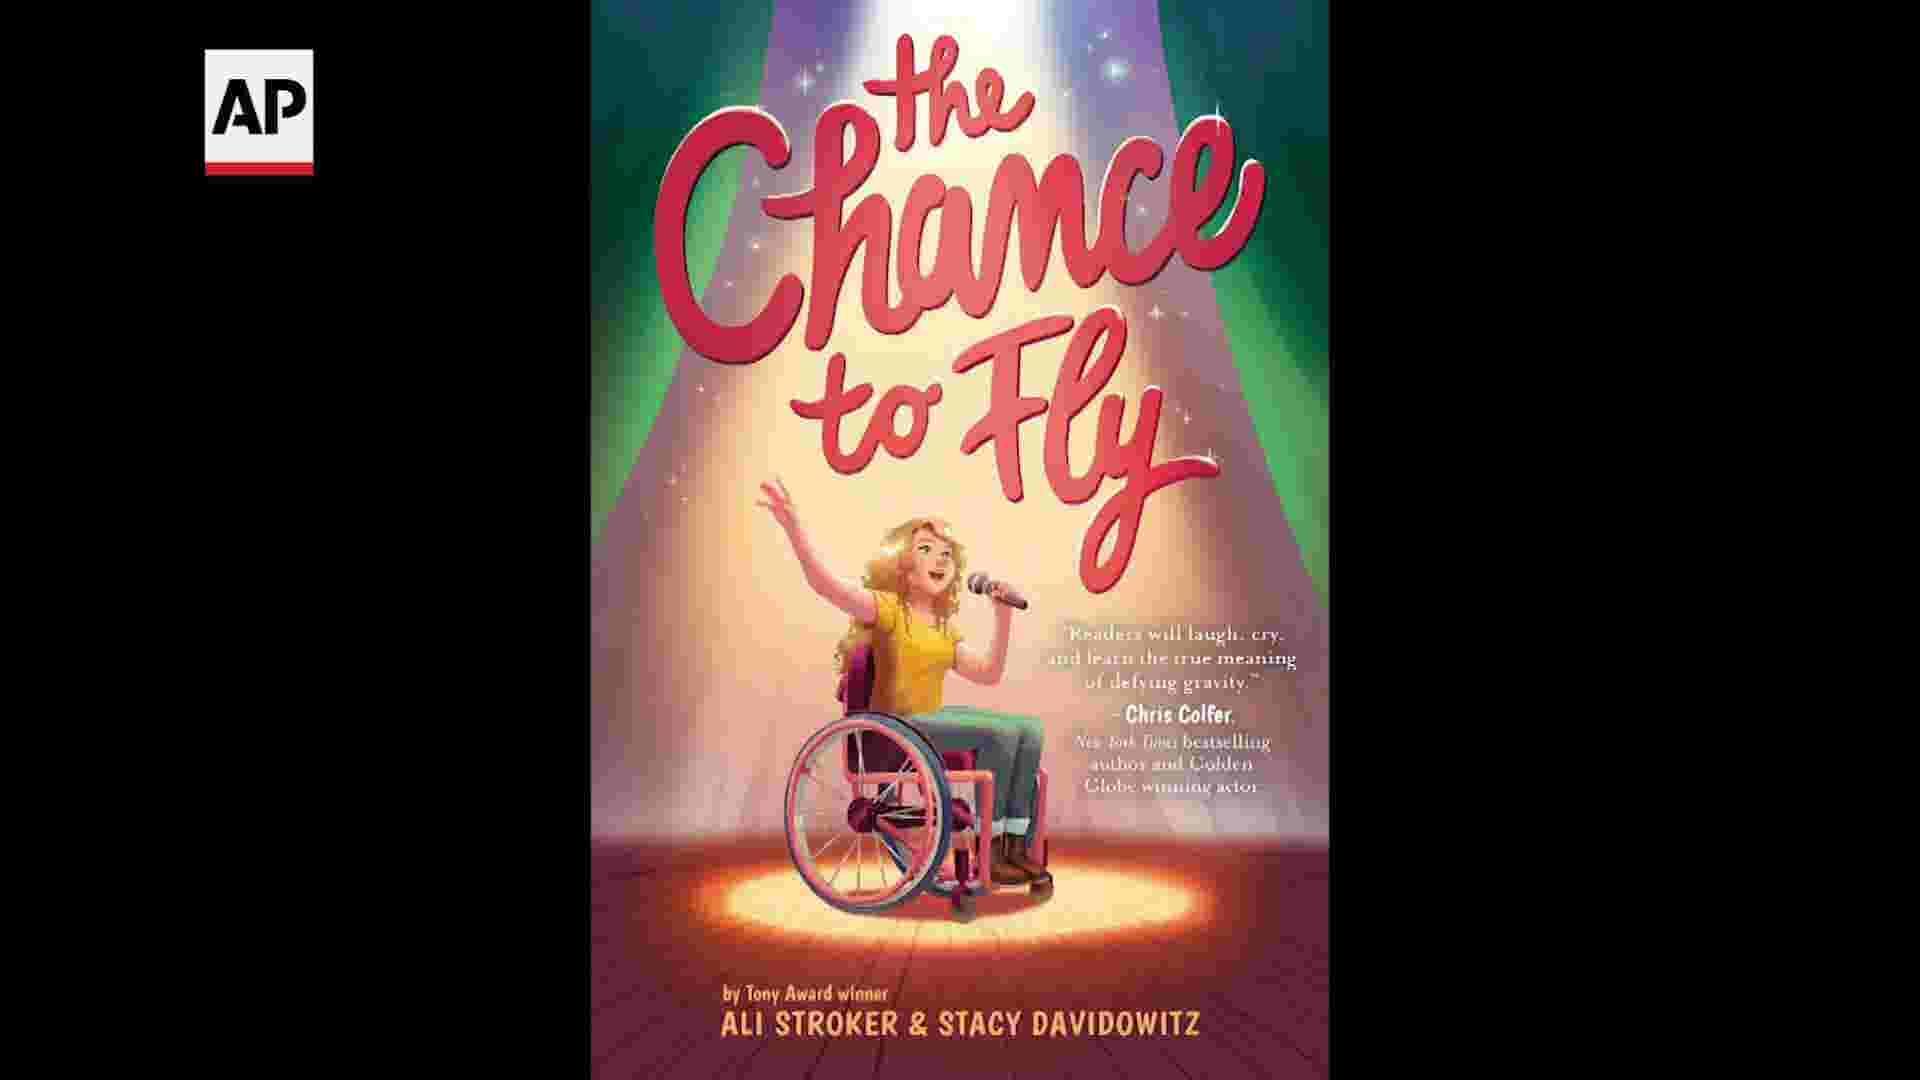 Ali Stroker book offers representation, empowerment